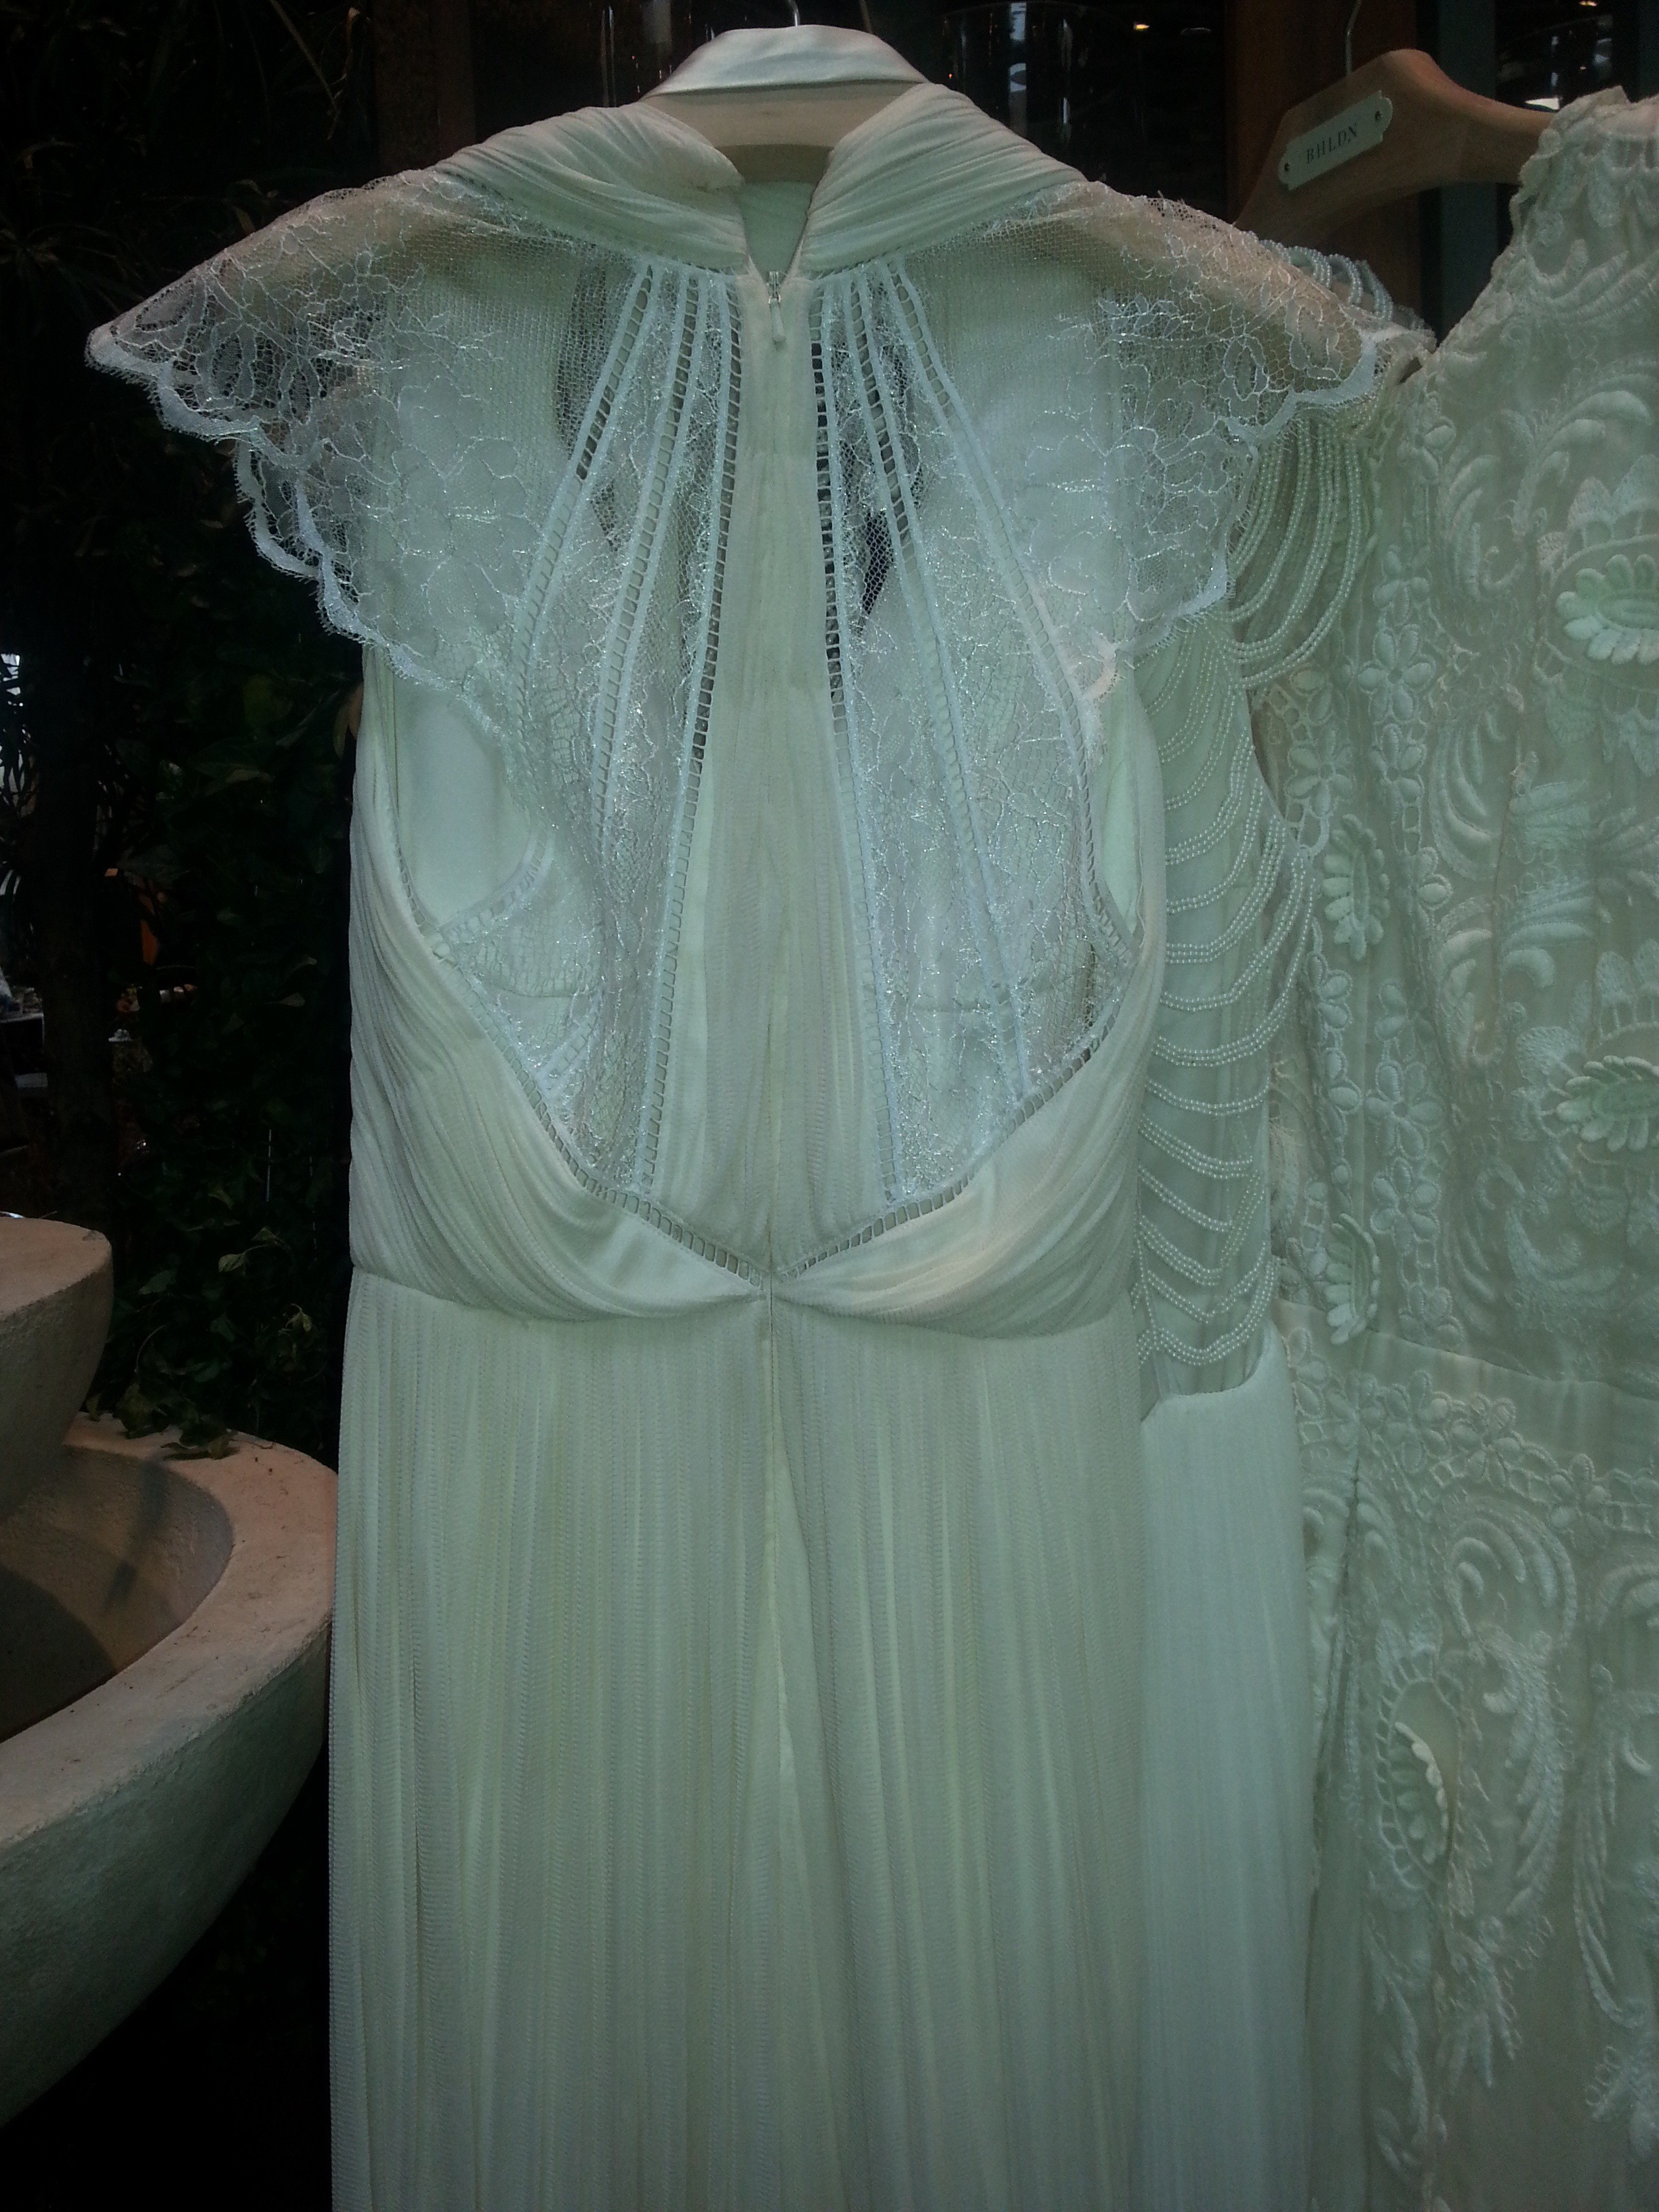 dress 4 reception dress